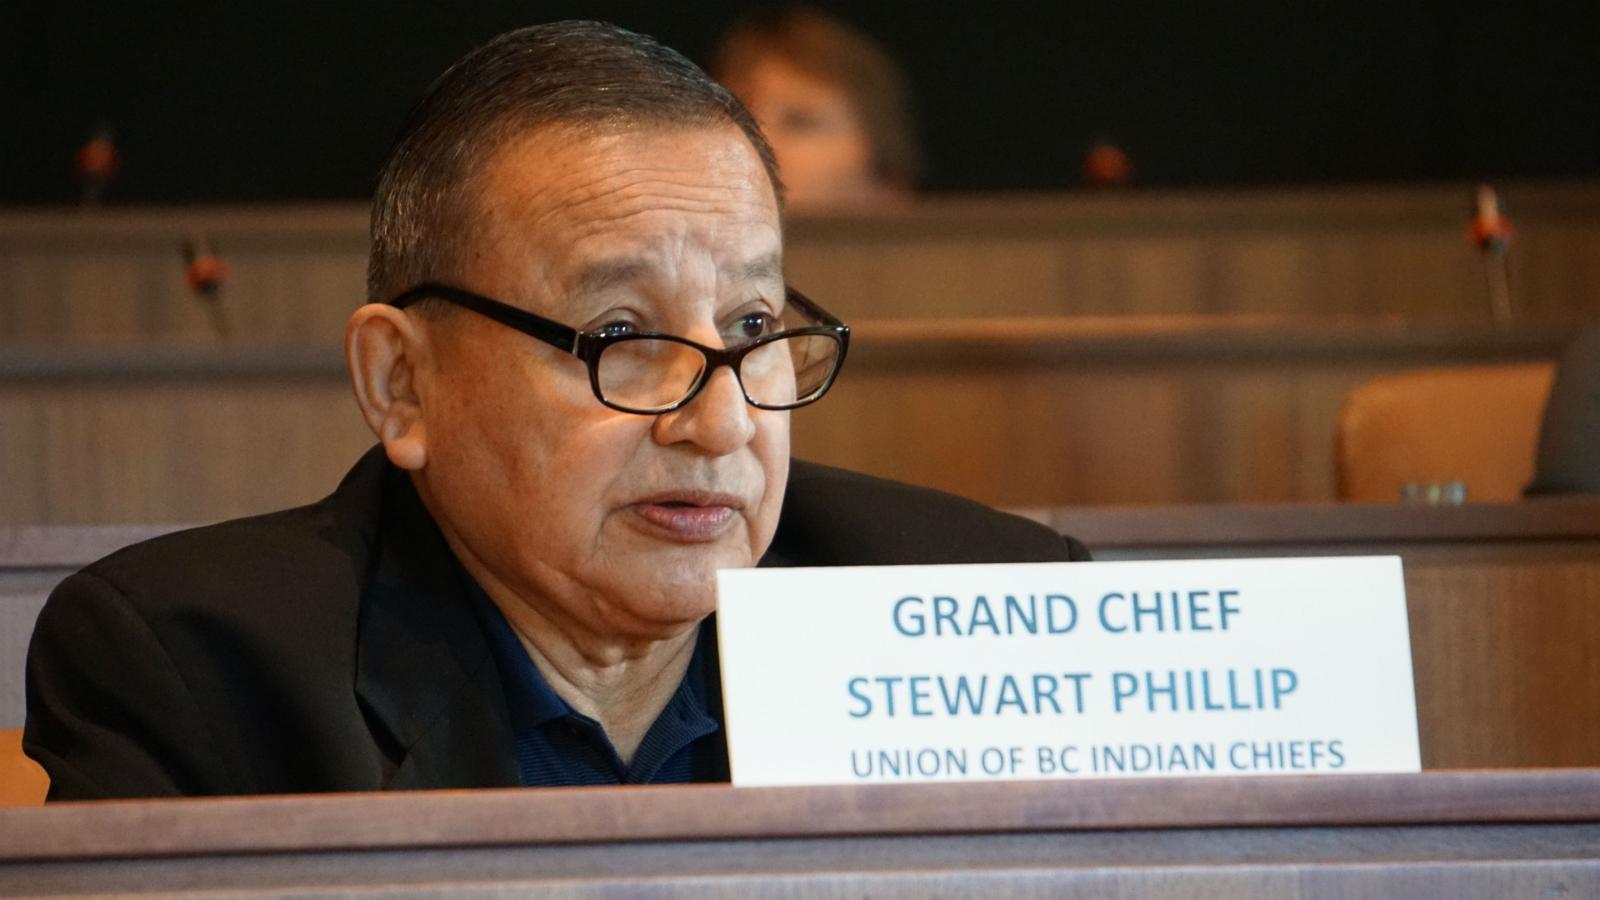 Grand Chief Stewart Phillip, Melanie Mark, Kinder Morgan, Trans Mountain expansion